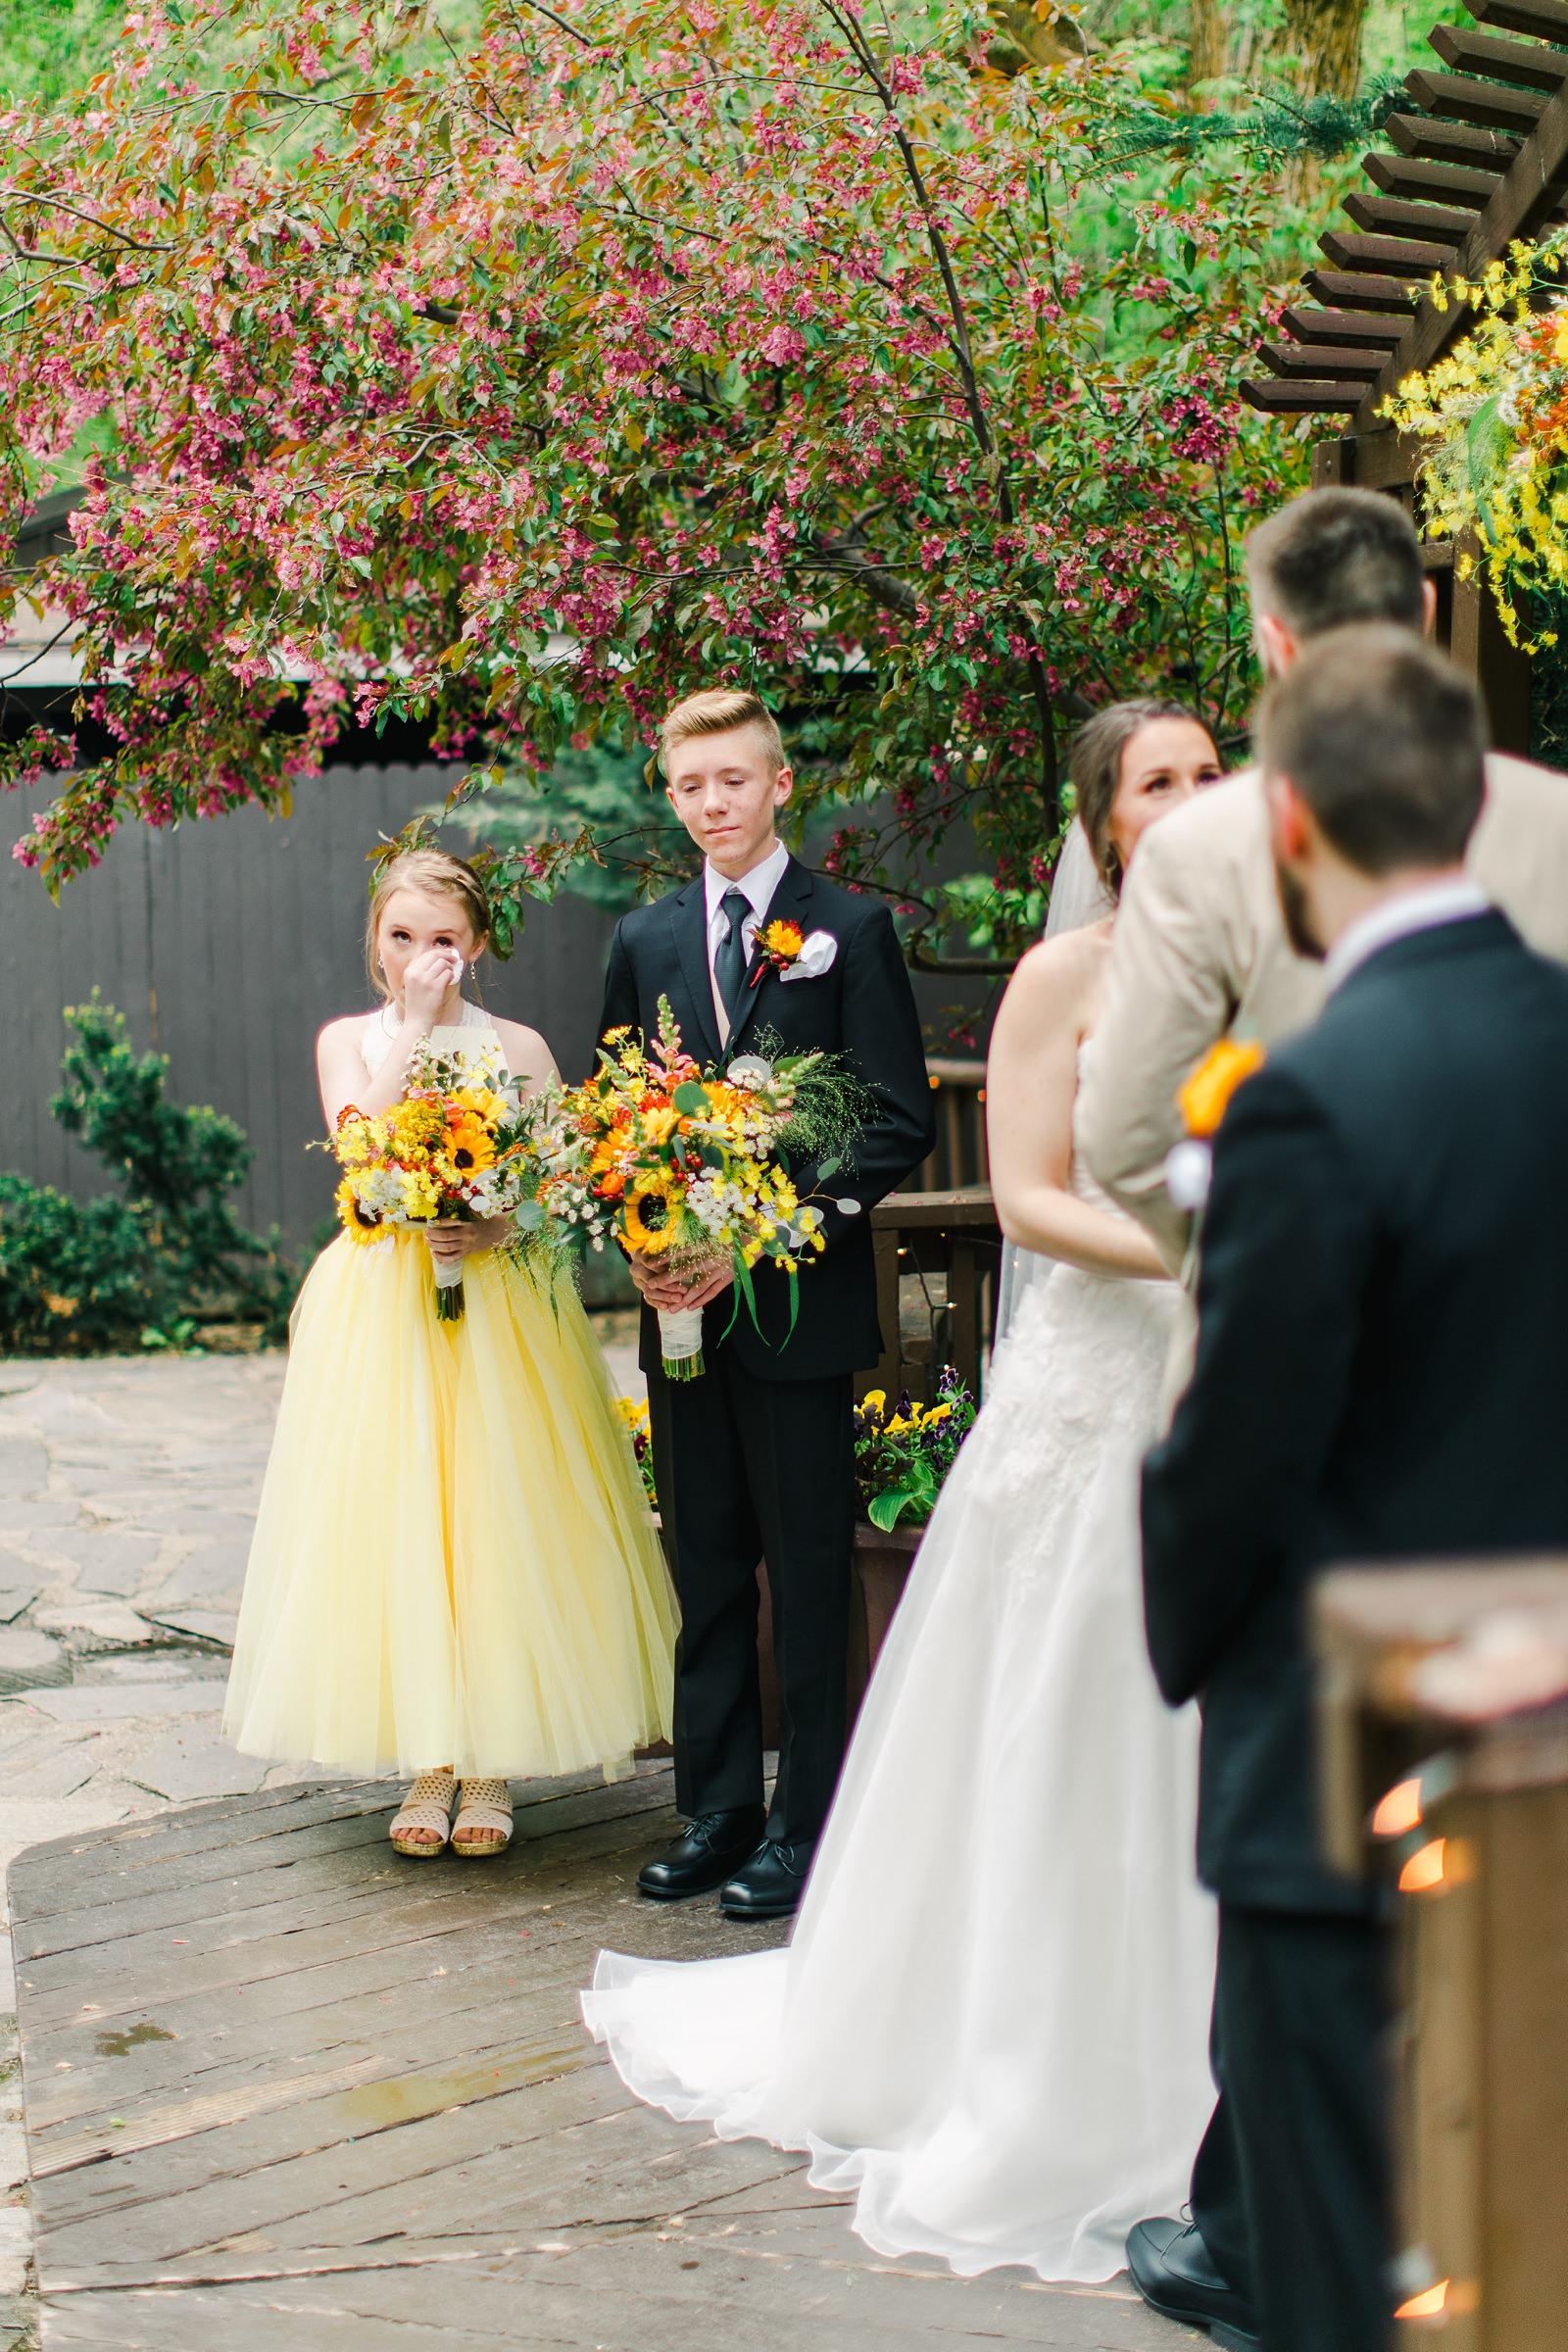 Millcreek Inn Summer Wedding, Utah wedding photography Millcreek Canyon, Salt Lake City, mountain ceremony, yellow bridesmaid dress, sunflower bouquet flowers